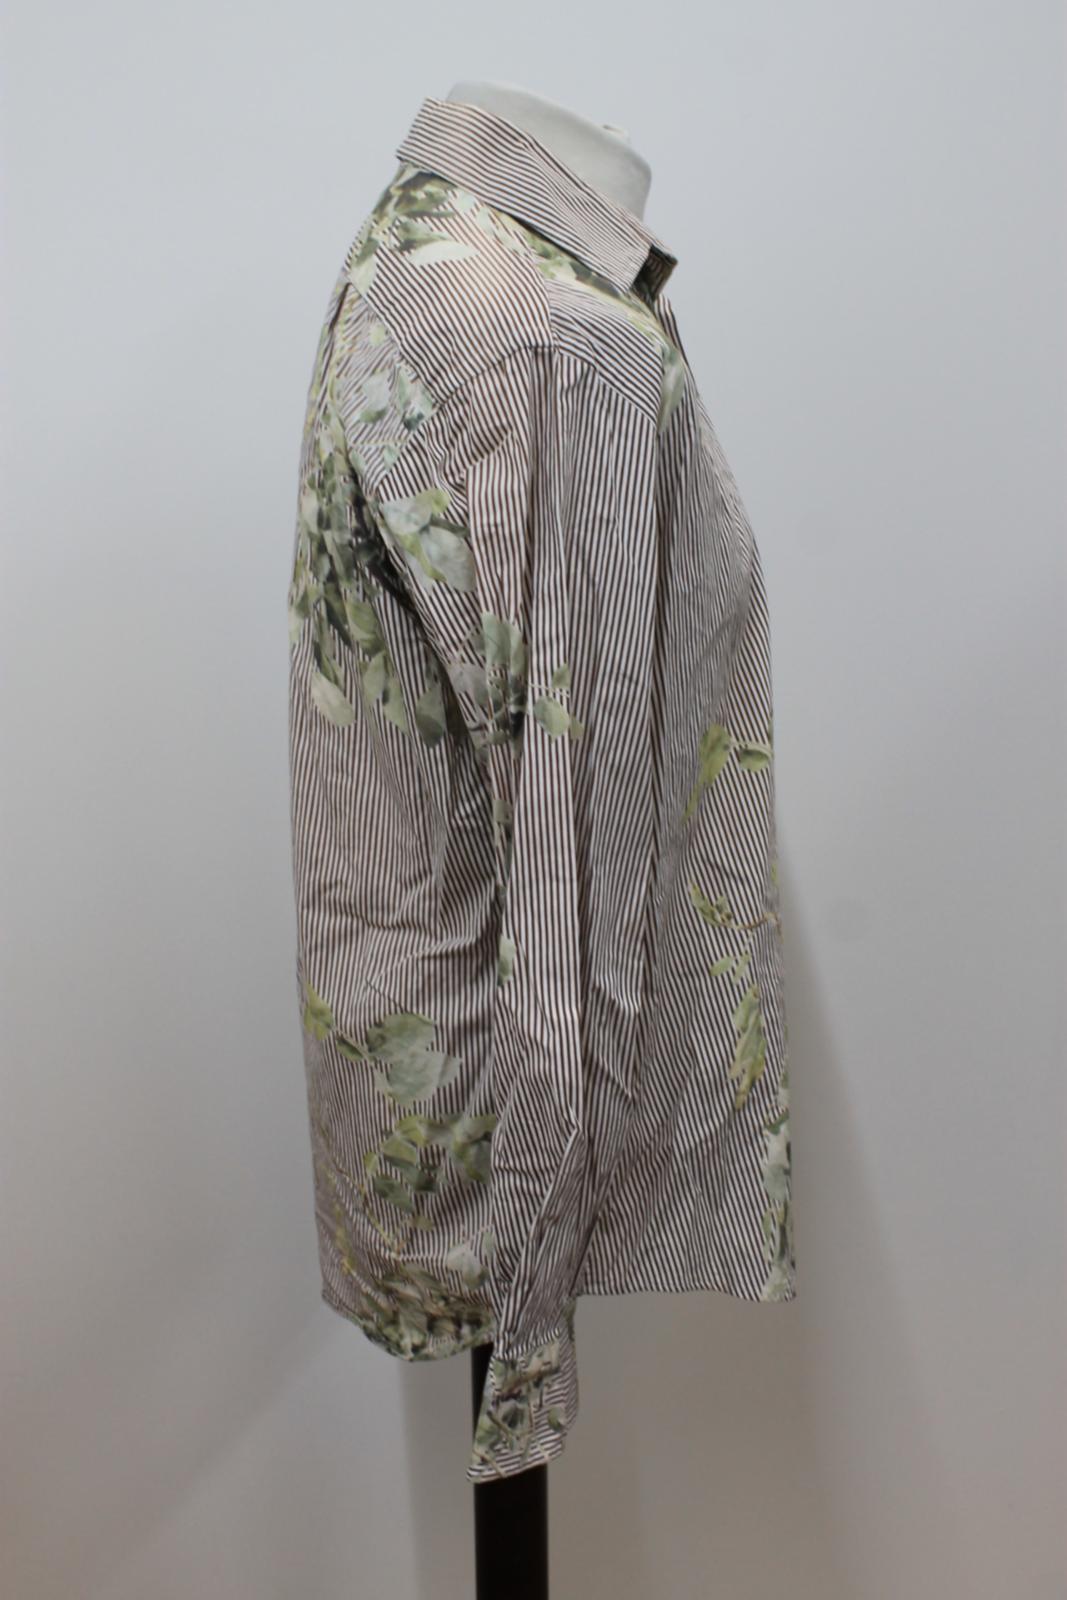 Paul-Smith-Para-Hombre-Marron-Verde-A-Rayas-Manga-Larga-de-impresion-de-hojas-Algodon-Camisa-Tamano miniatura 4